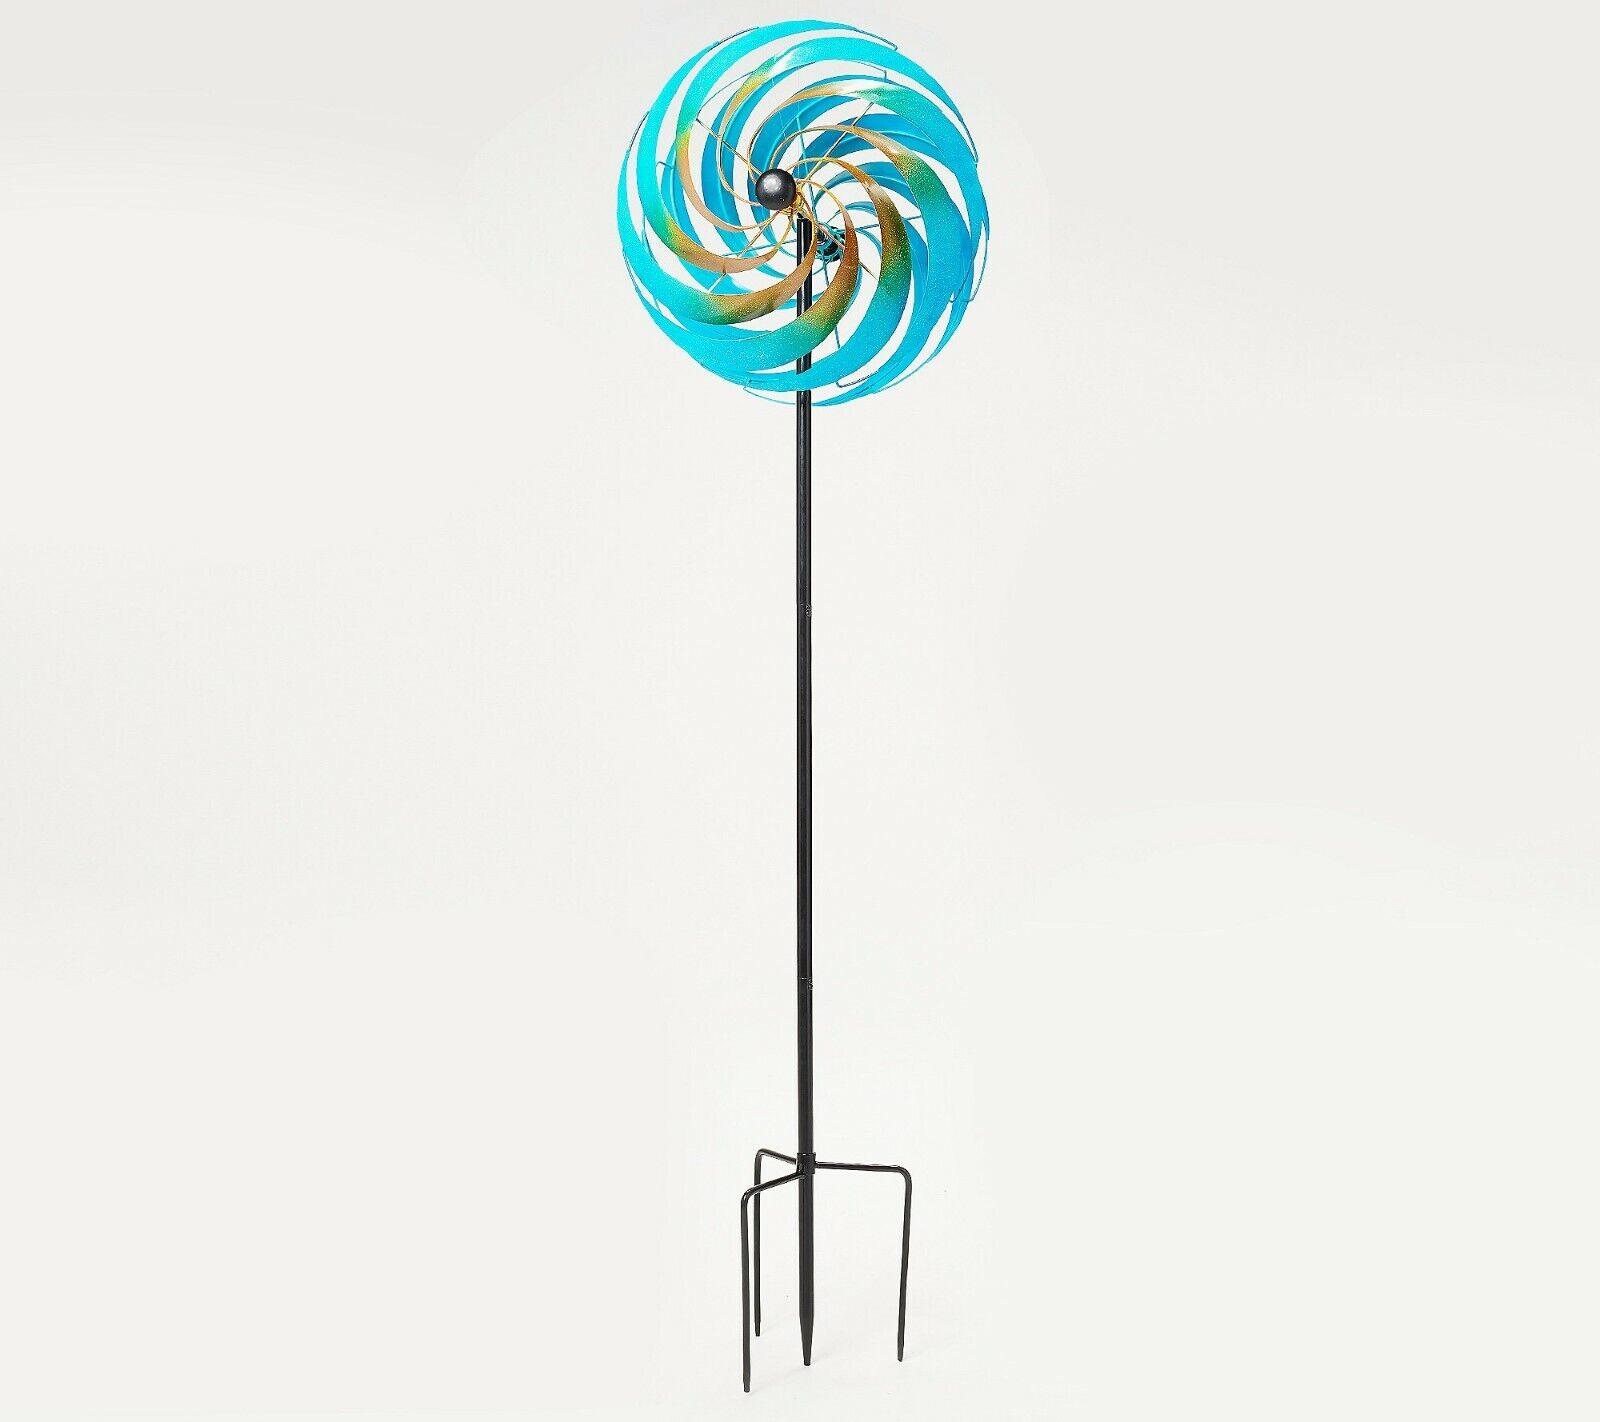 Plow & Hearth Oversized Illusion Swirl Wind Spinner Garden Decor